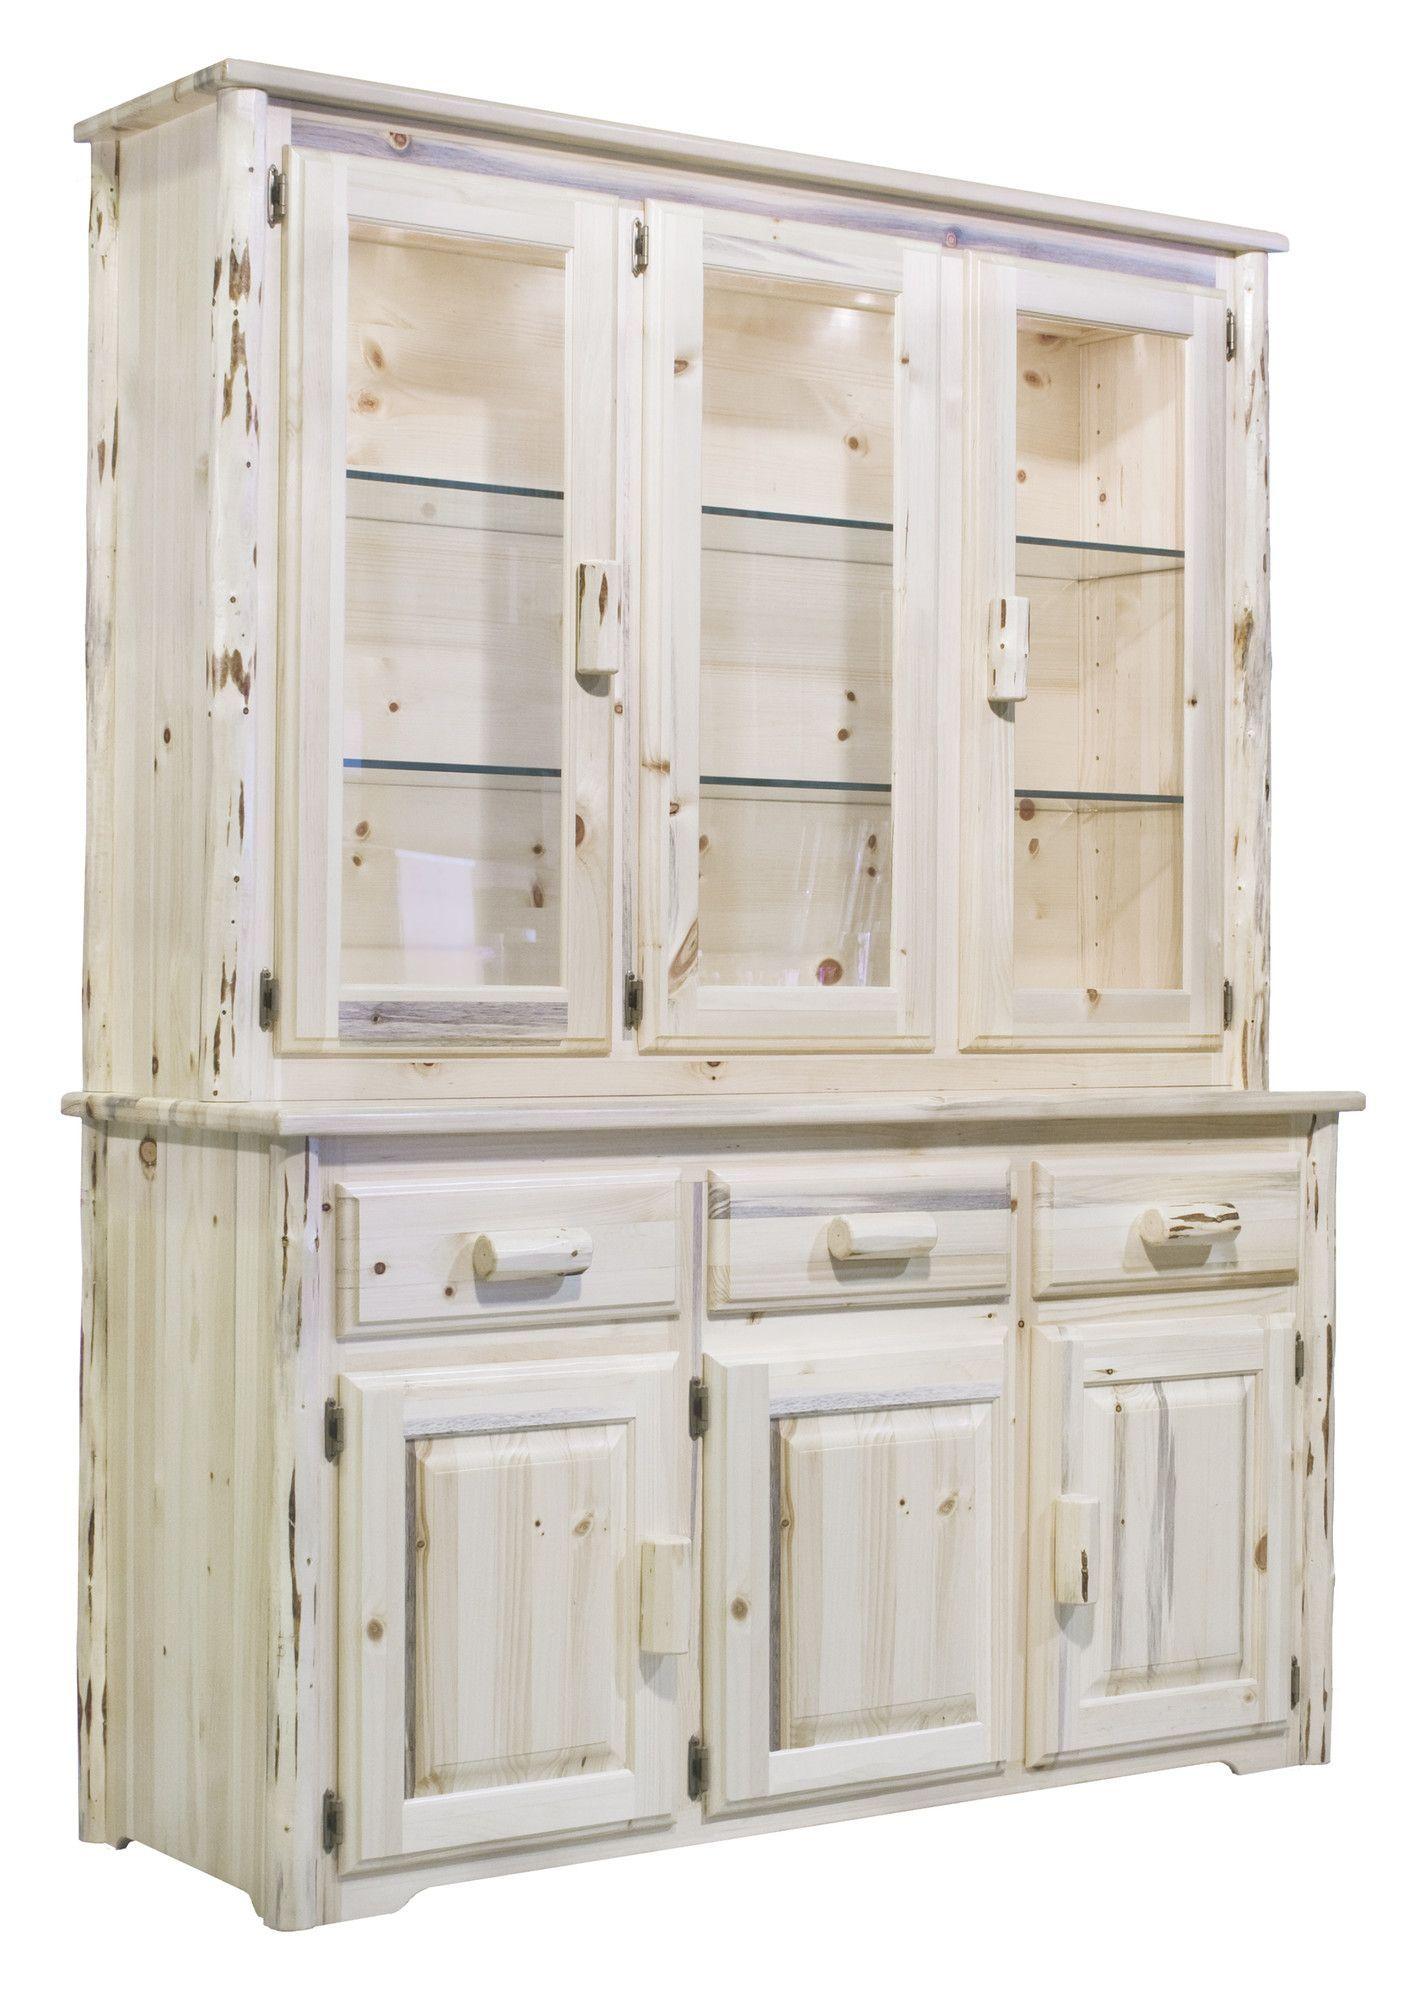 Montana China Cabinet Top  Products  Pinterest  China Cabinets Mesmerizing White Kitchen Hutch Design Ideas